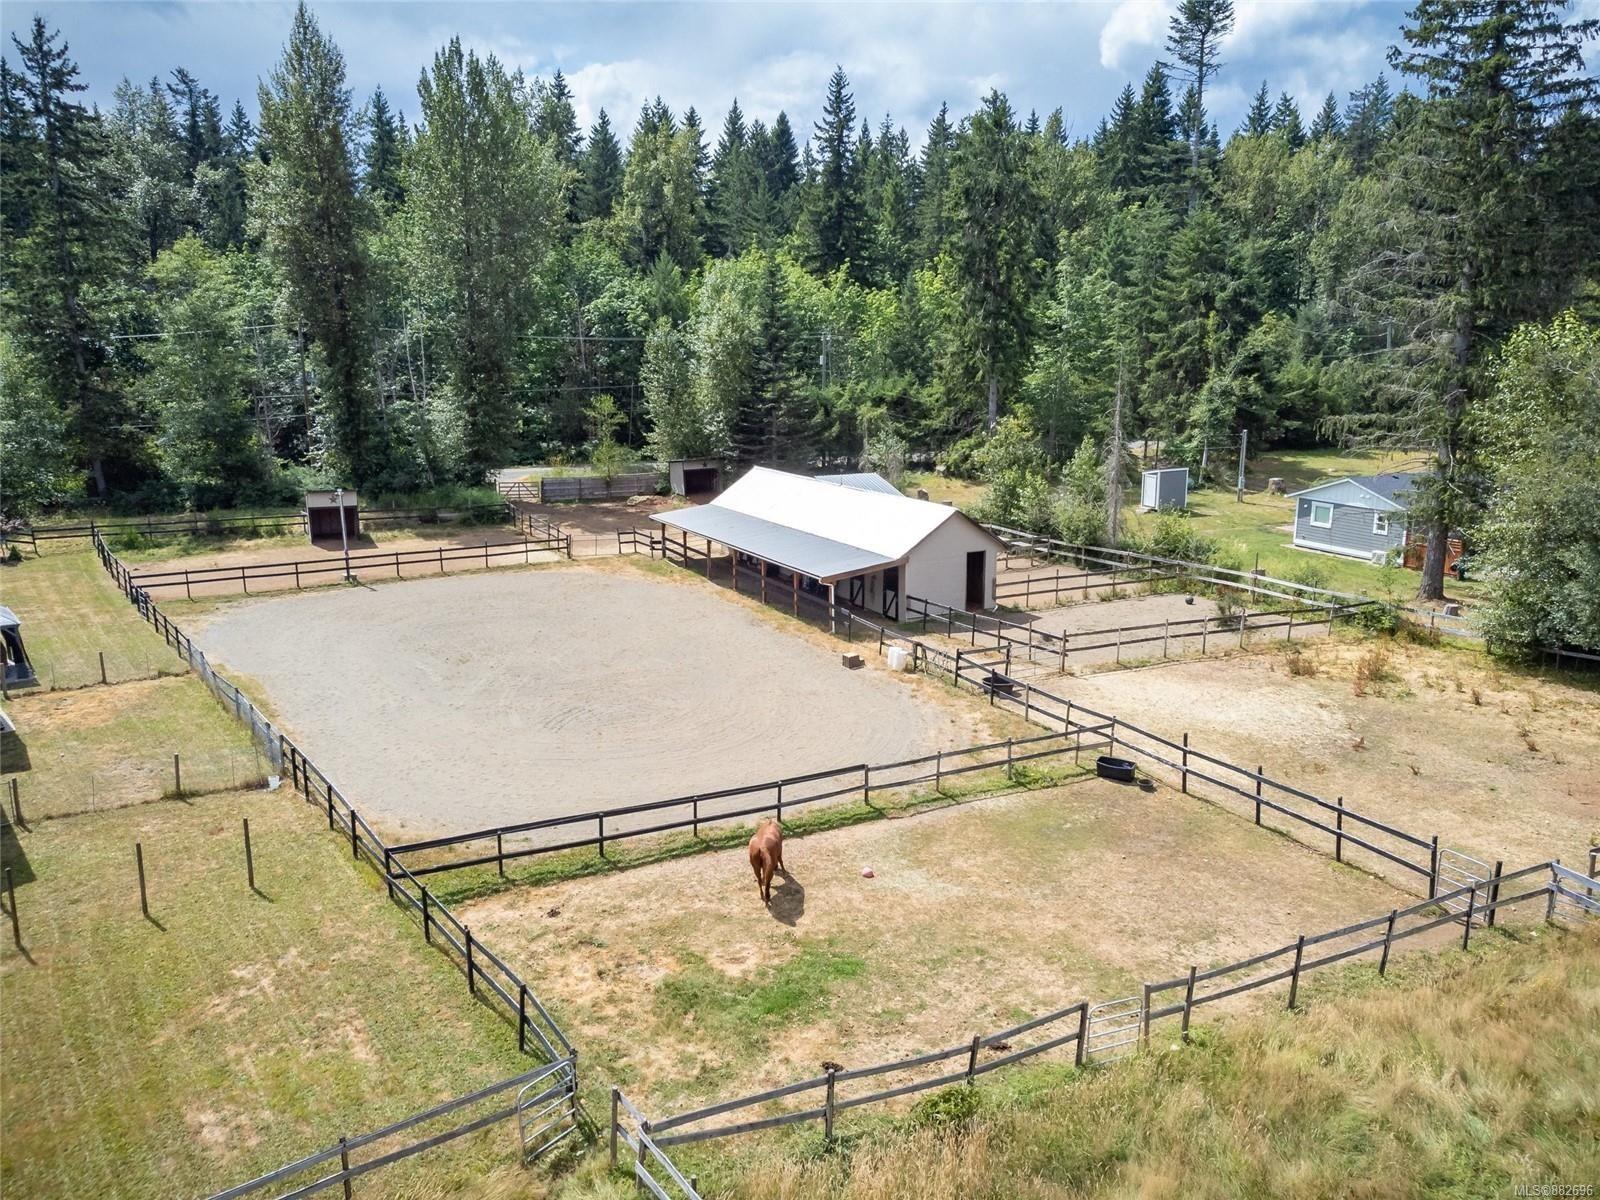 Photo 36: Photos: 3554 MacAulay Rd in : CV Merville Black Creek House for sale (Comox Valley)  : MLS®# 882696